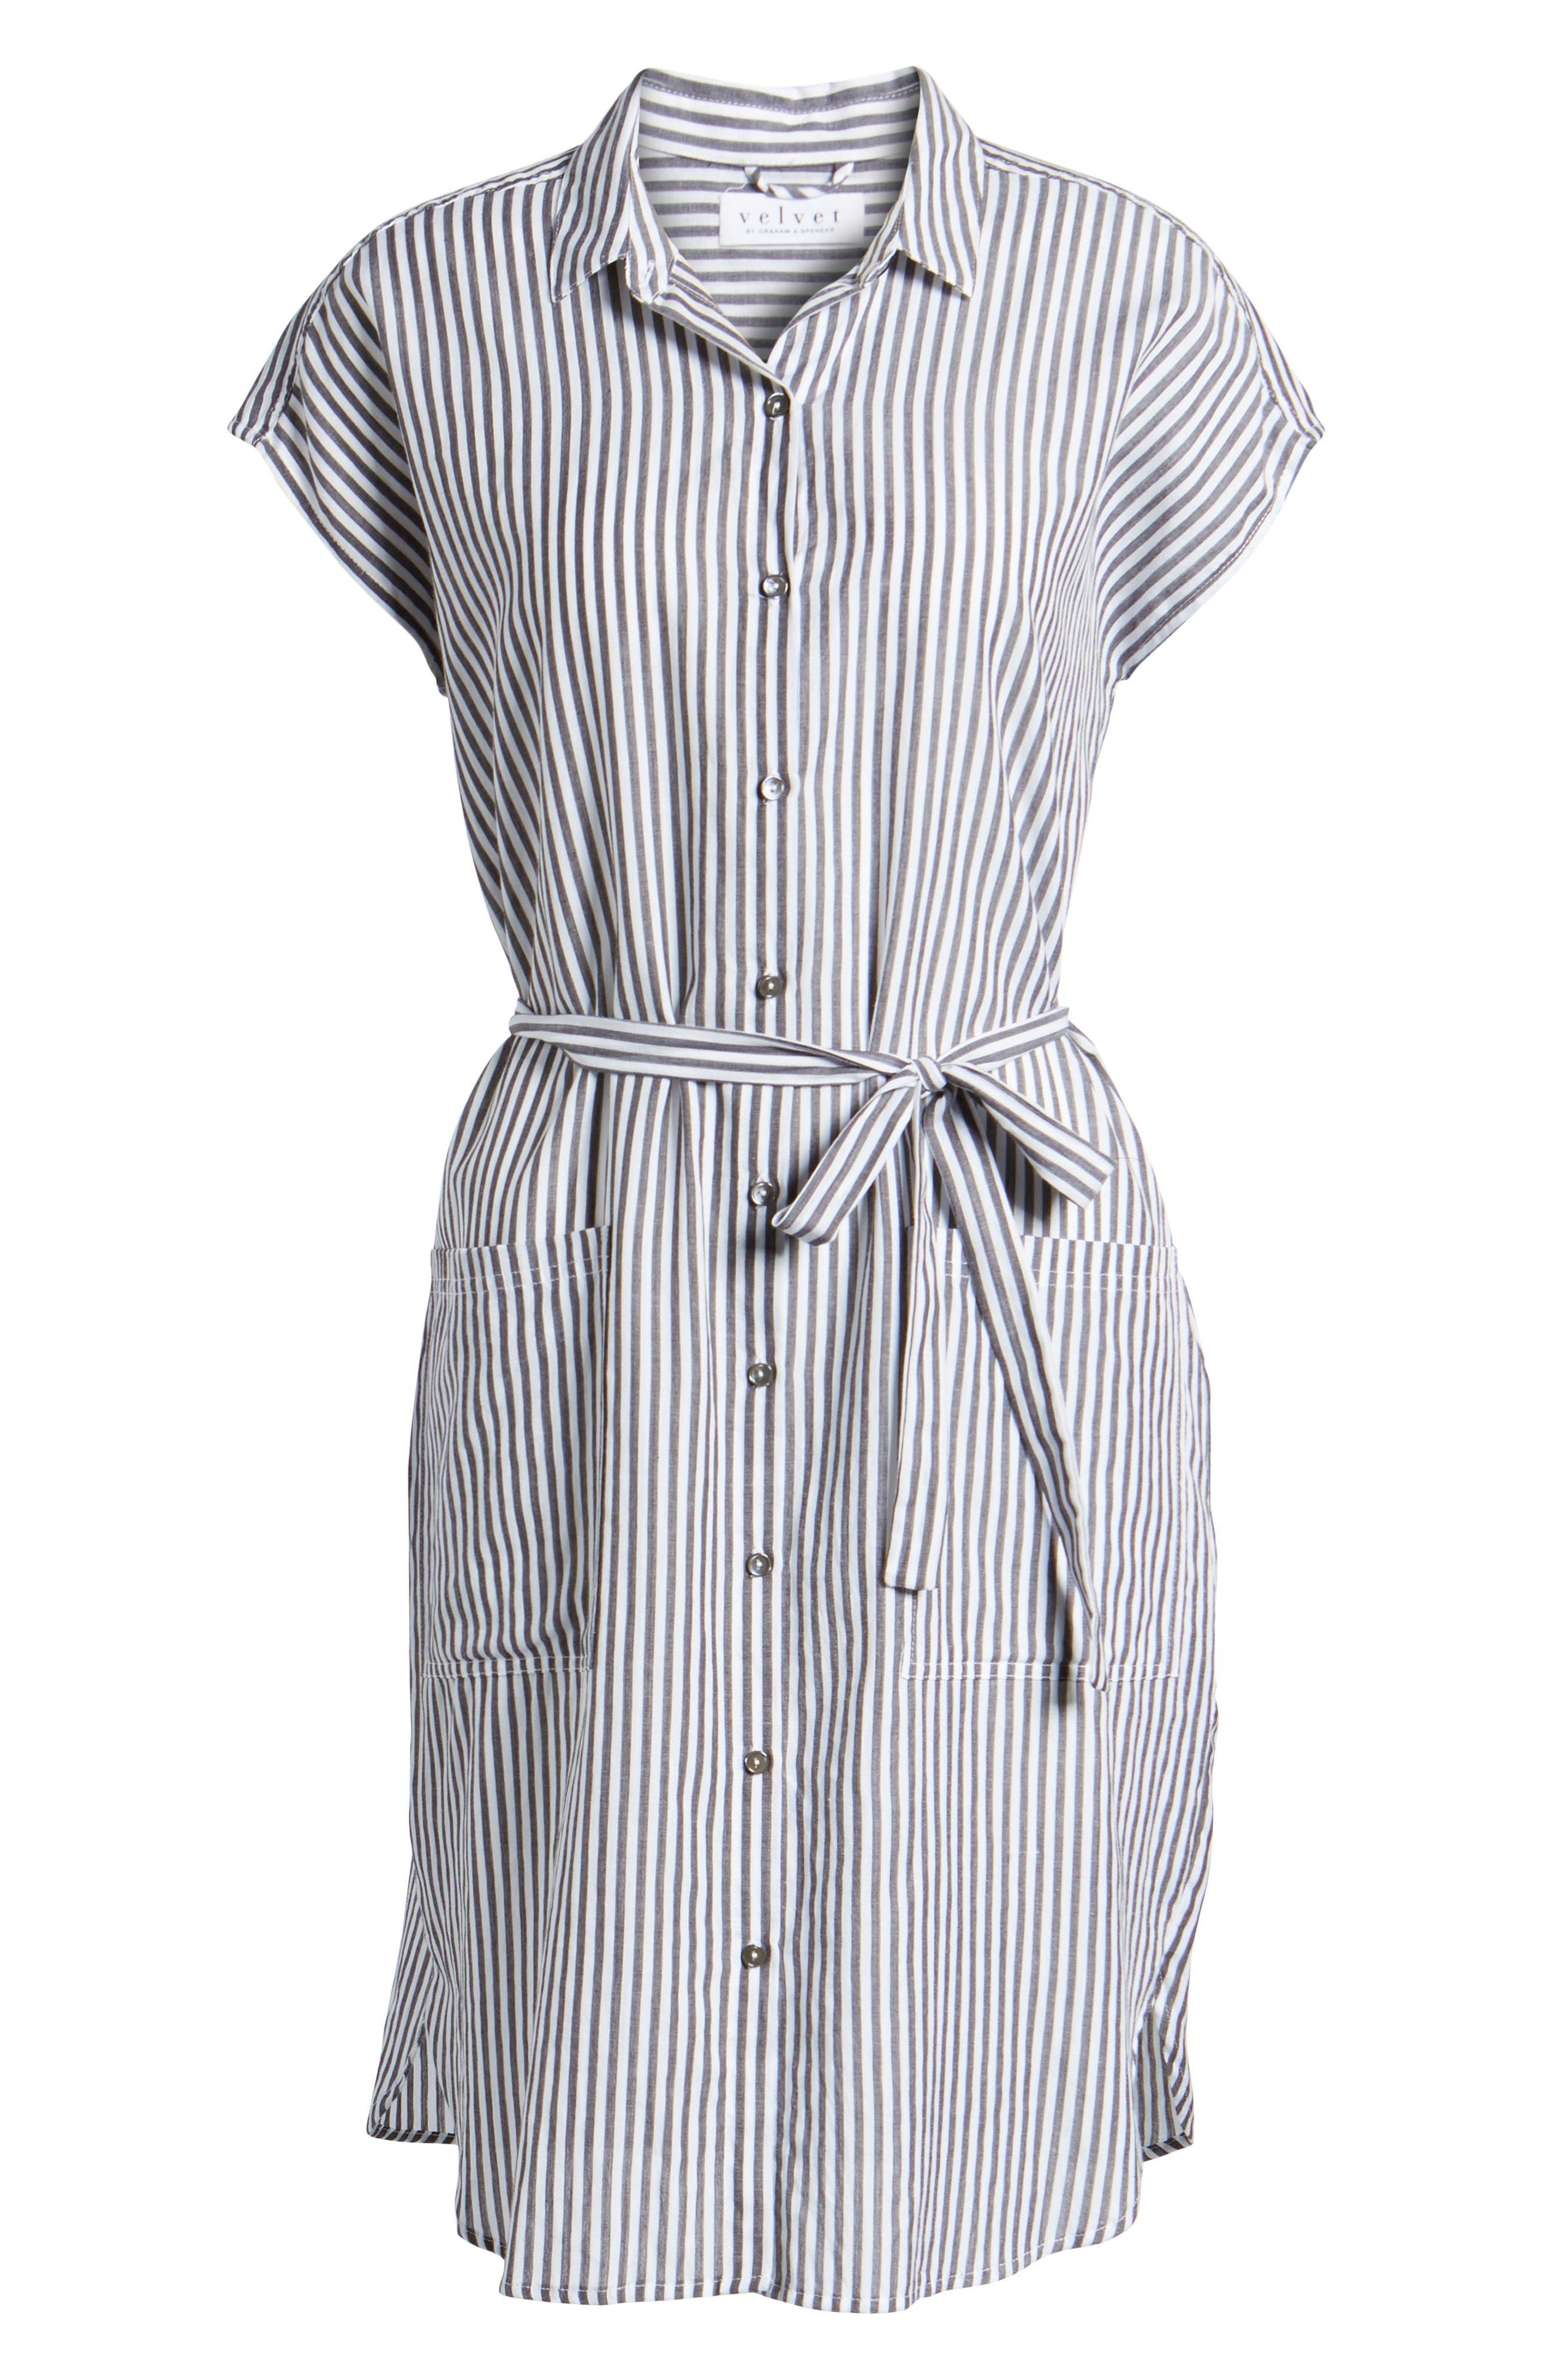 Stripe Belted Cotton Shirtdress,                             Alternate thumbnail 6, color,                             024